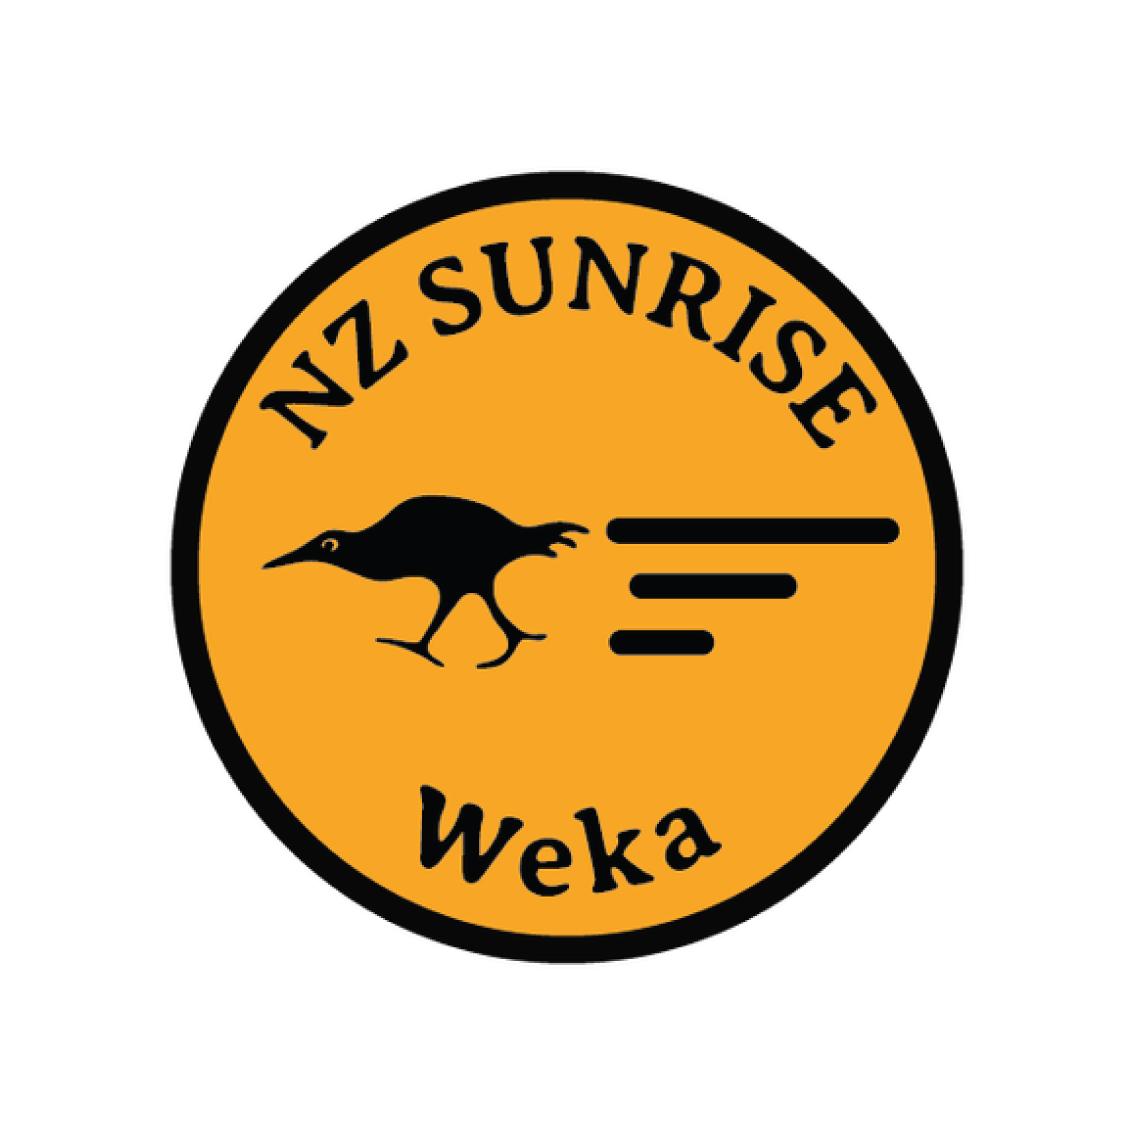 weka badge@2x.png